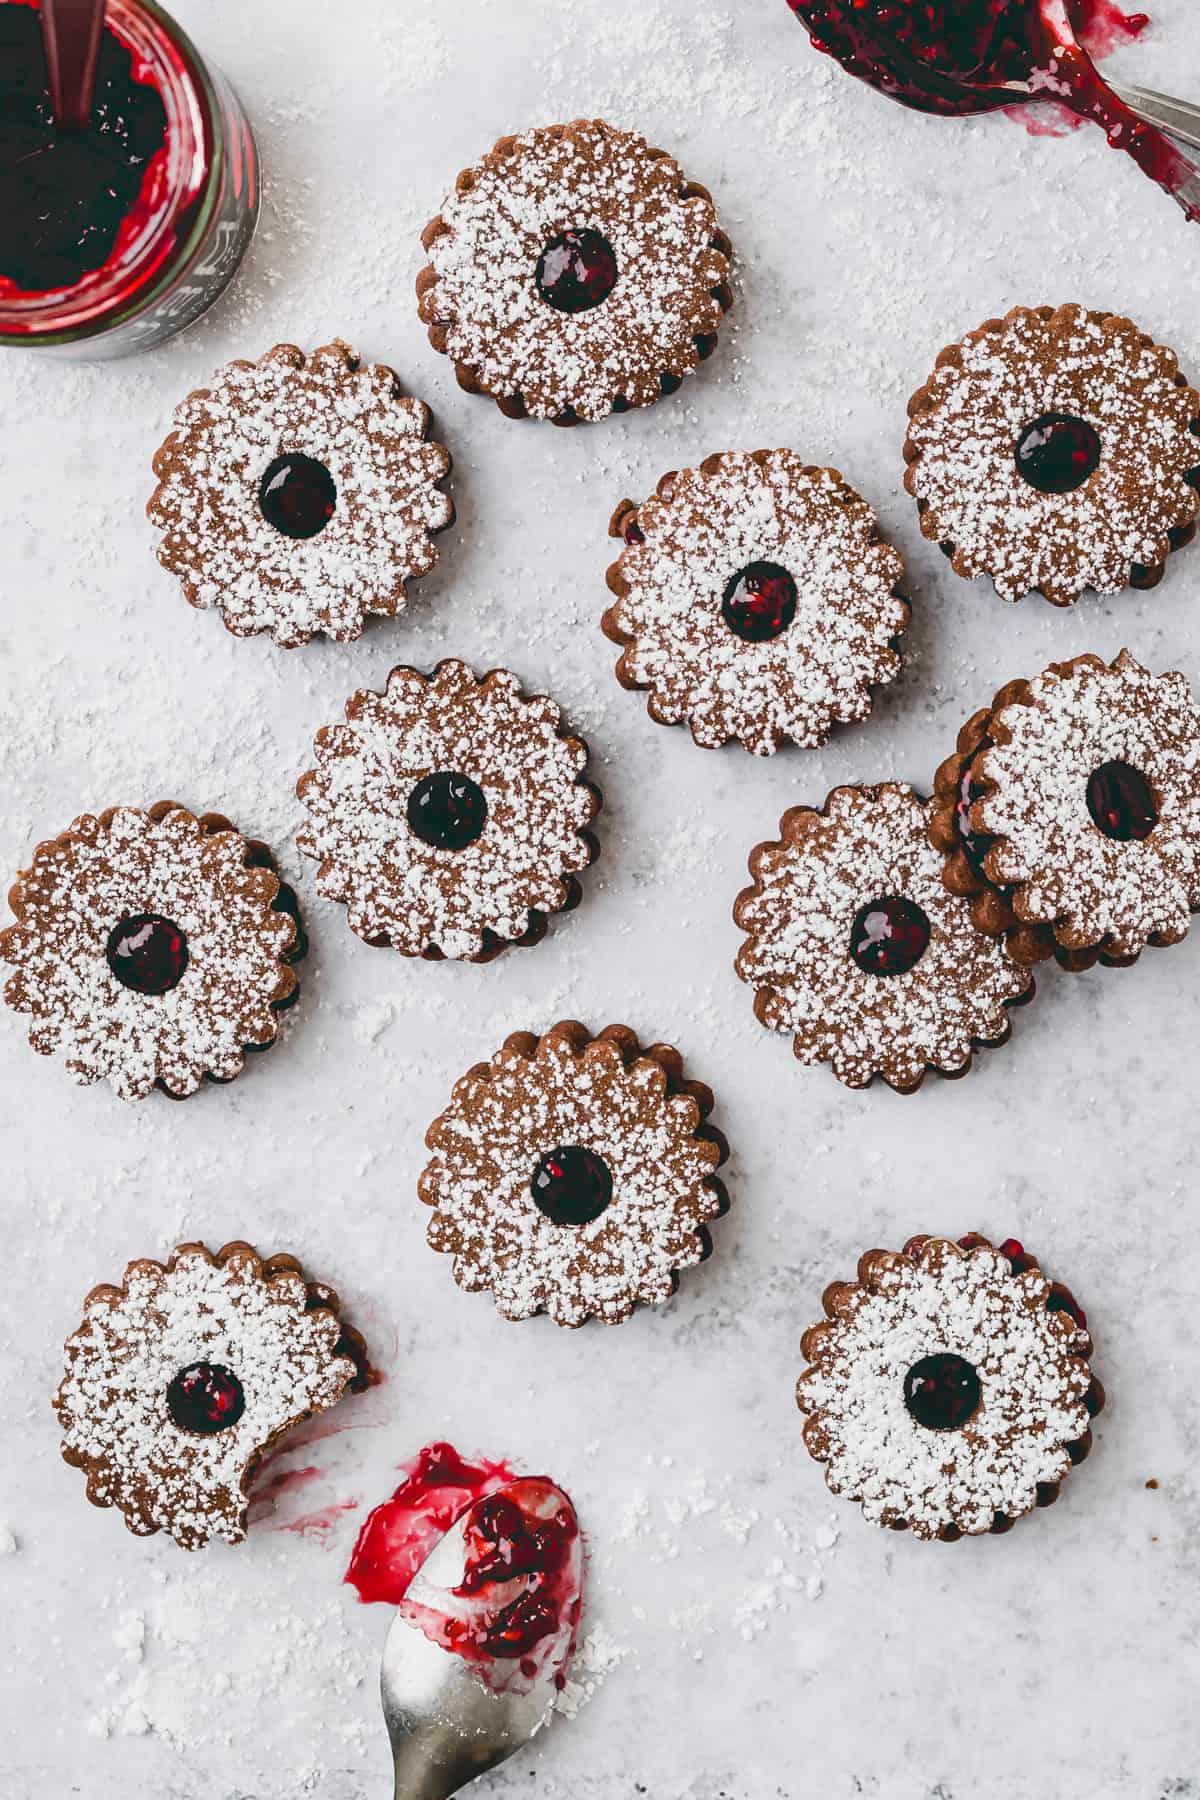 raspberry linzer cookies next to a jar raspberry jam